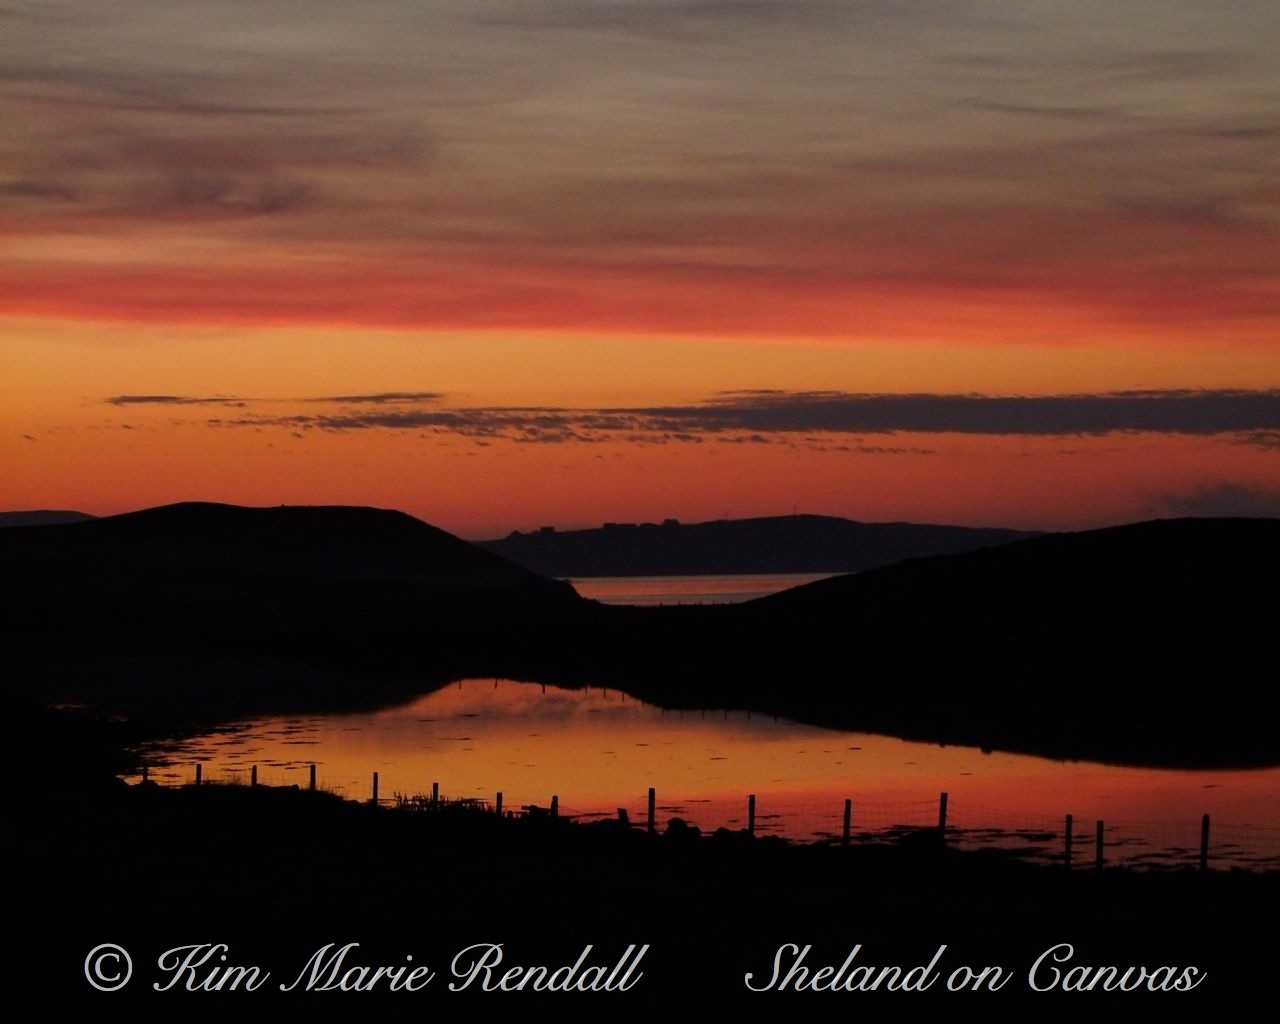 Vibrant Summer Sunset, North Nesting